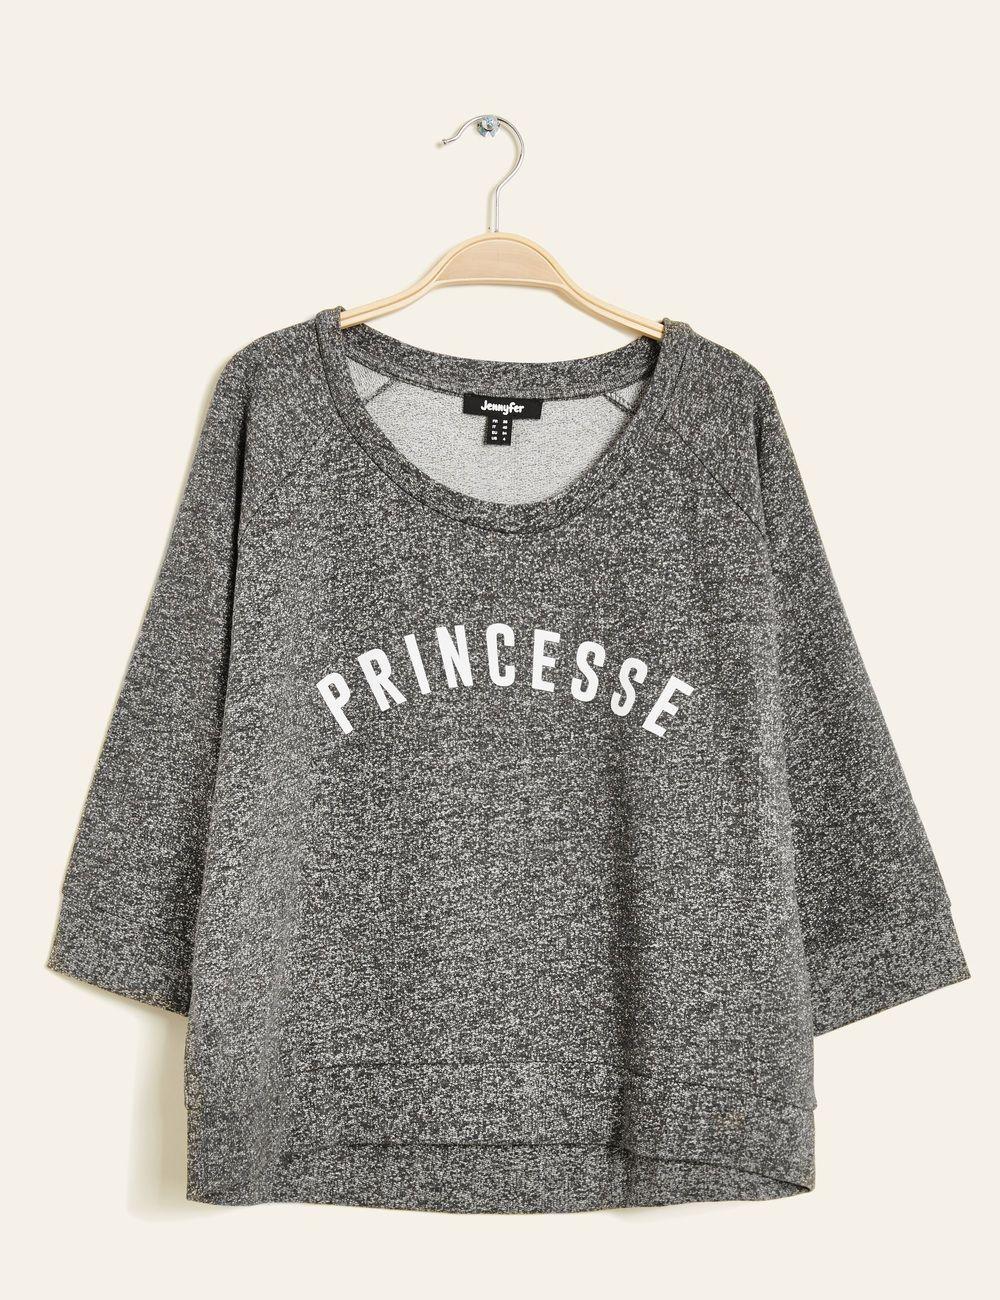 34b5ee70a78 Sweat imprimé princesse gris anthracite chiné femme • Jennyfer ...